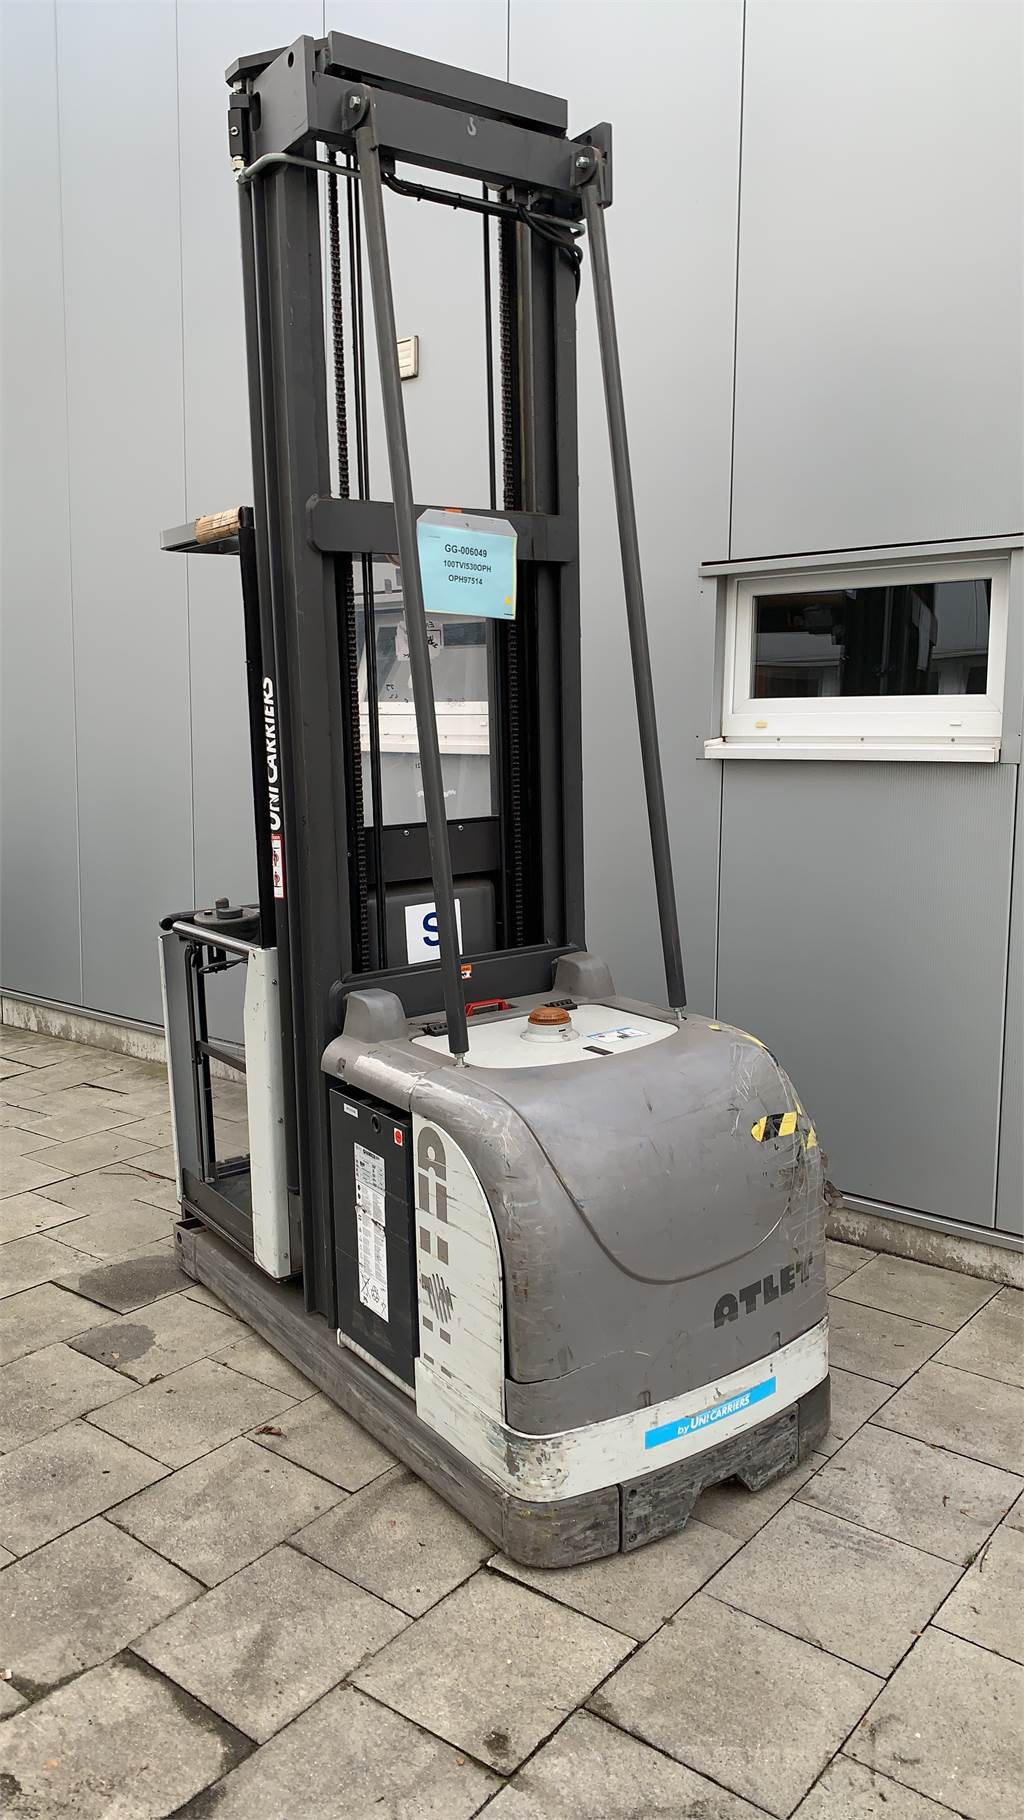 [Other] OPH100TVI530, Andere Gabelstapler, Flurförderzeuge